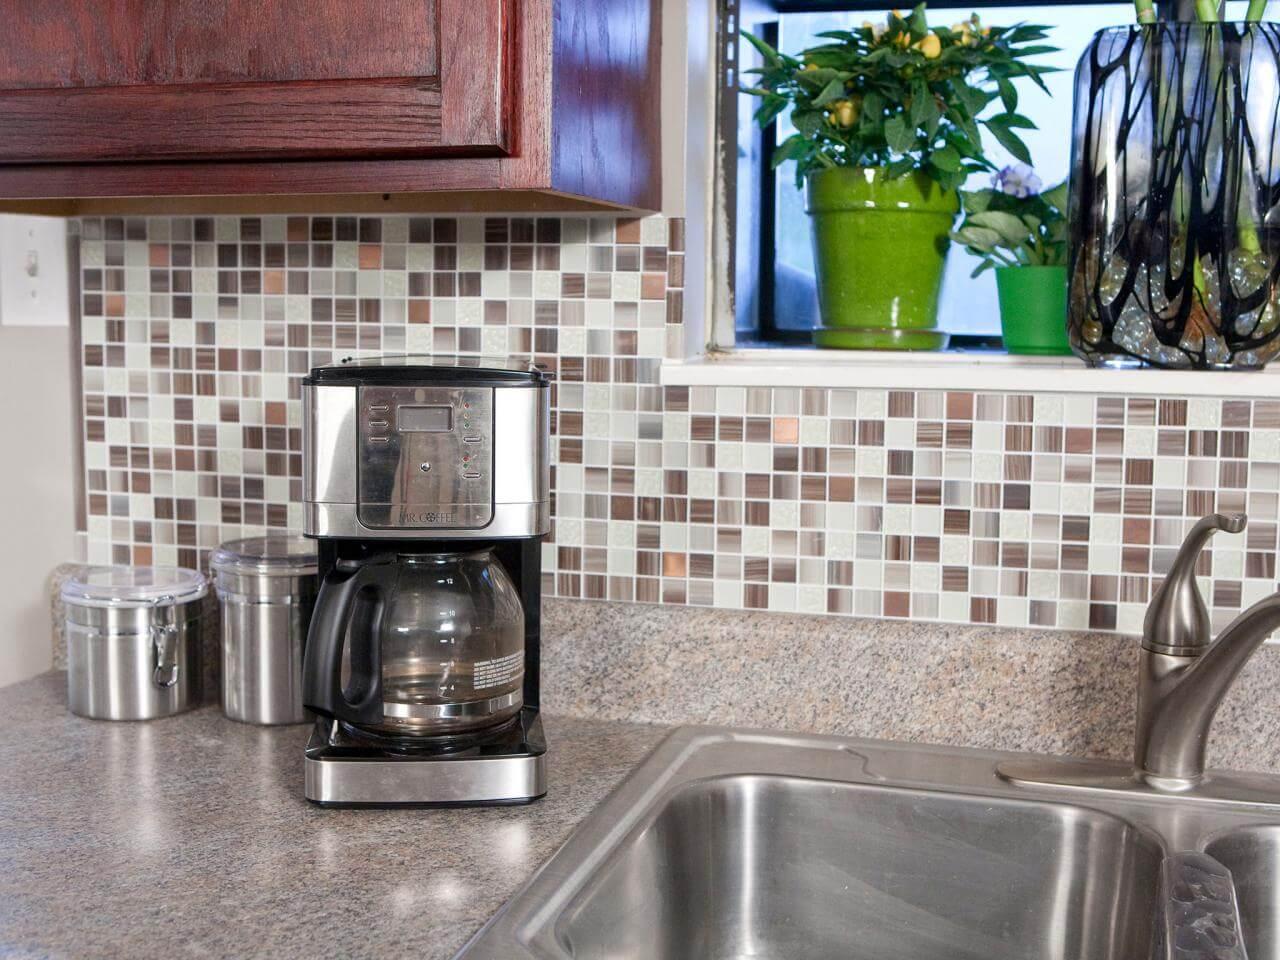 Self-adhesive tiles as a contemporary kitchen splashback